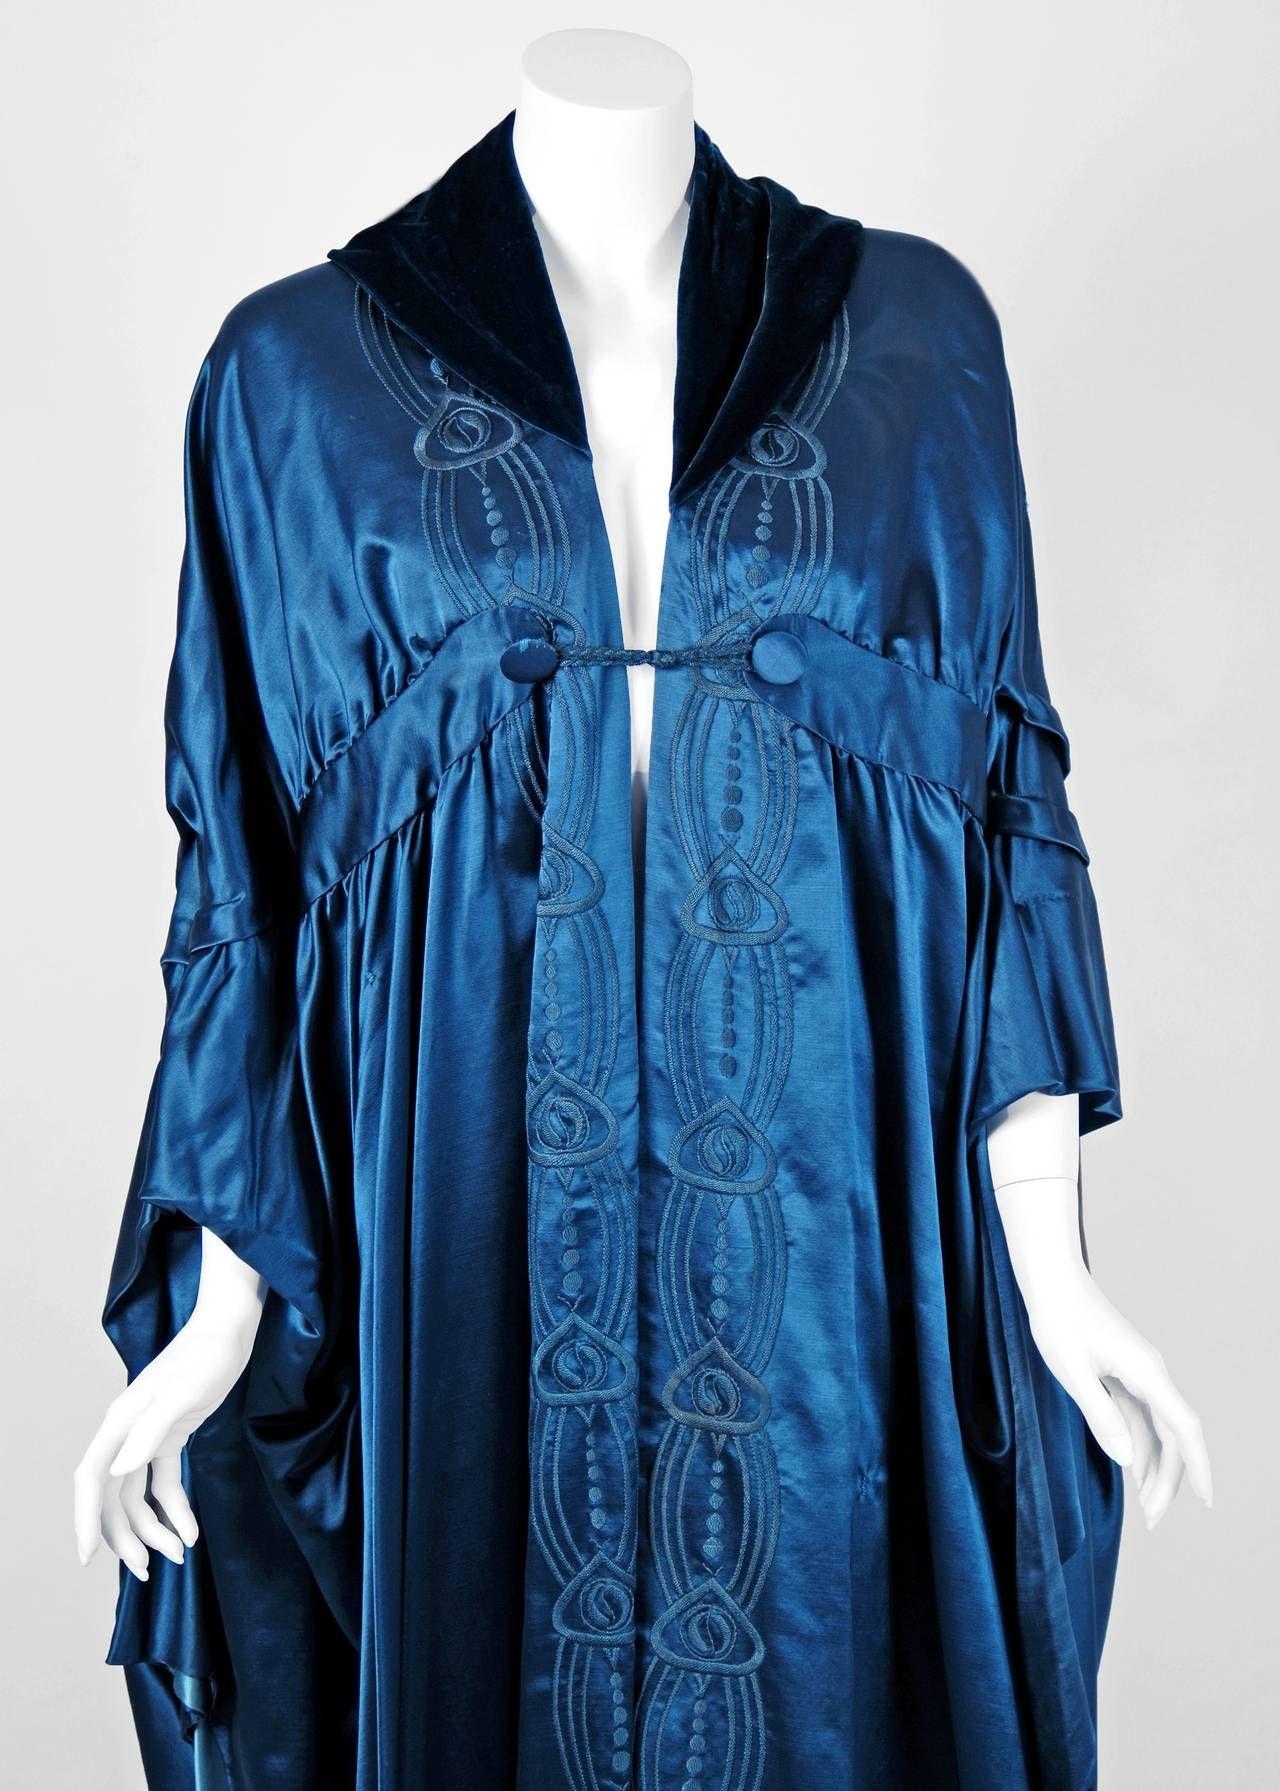 1918 Liberty Couture Steel-Blue Embroidered Silk Art-Nouveau Draped Coat Cape image 3